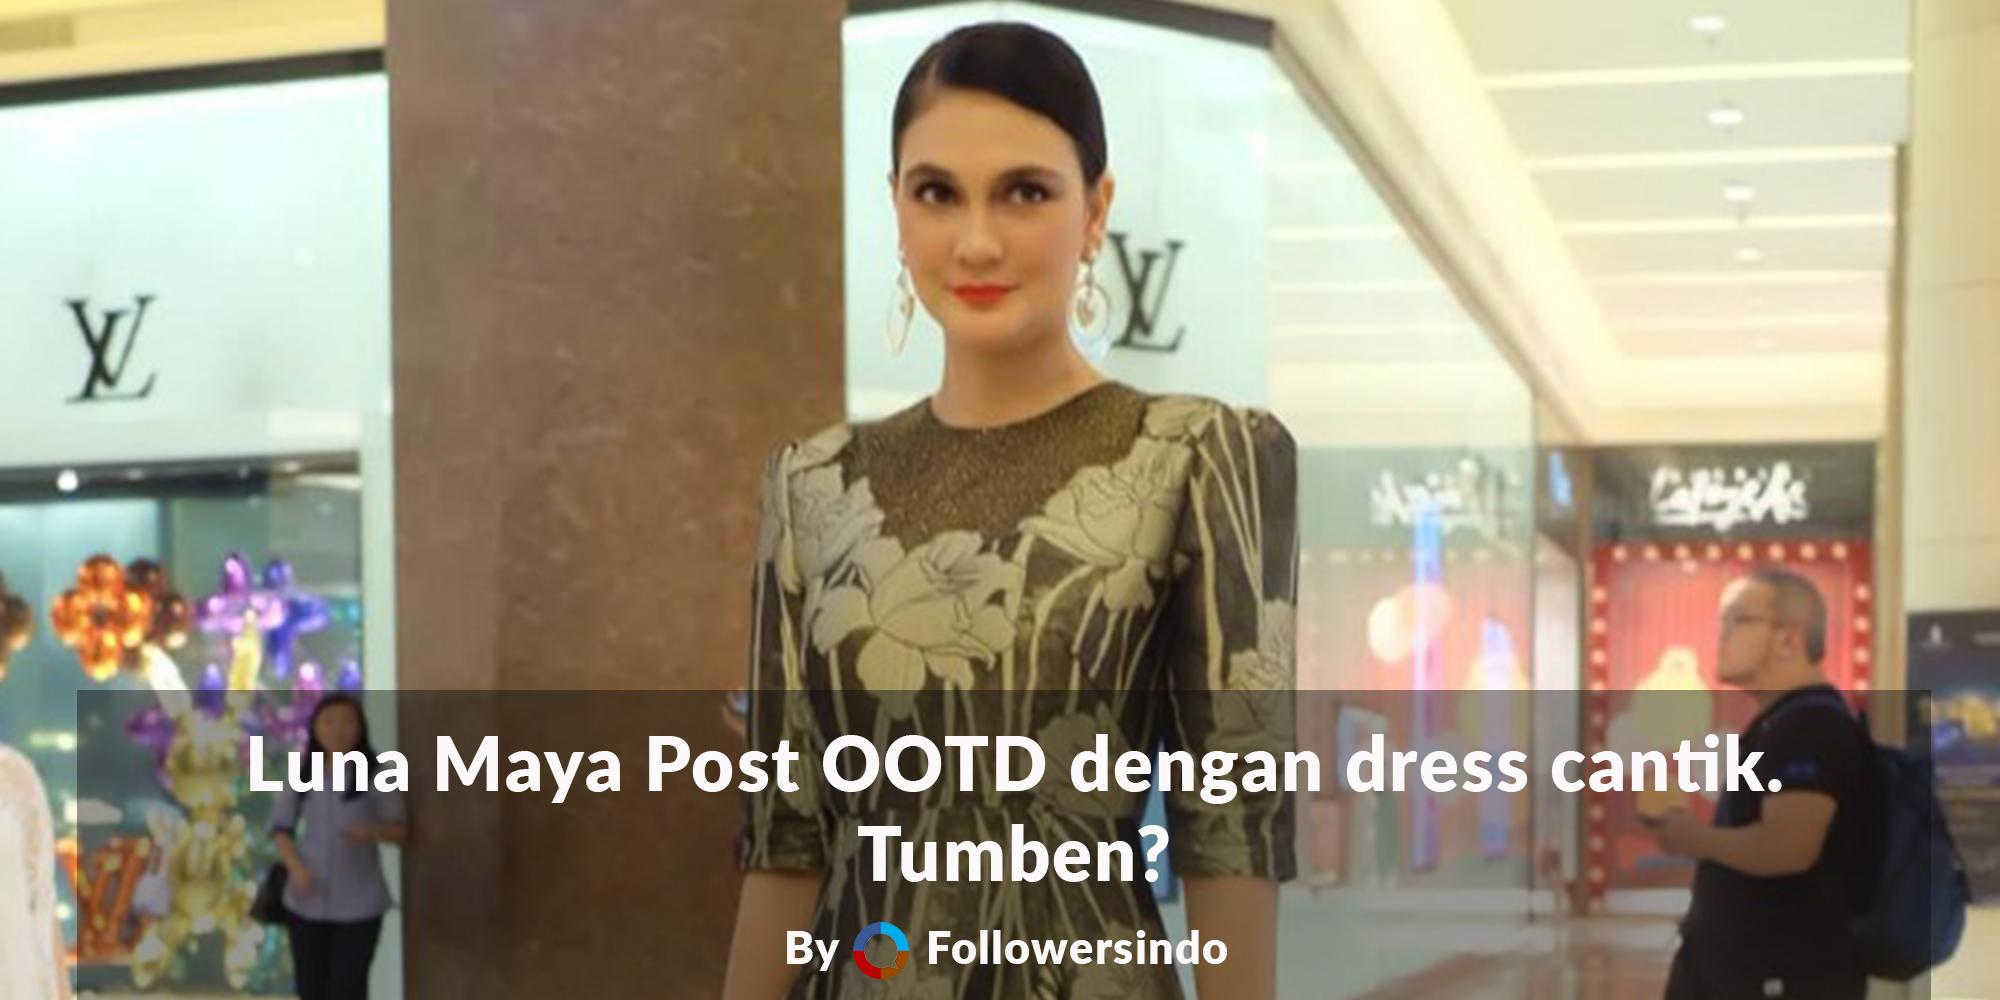 Posting Artis Indonesia! Luna Maya Post Gaya OOTD dengan Dress! - Followersindo.com